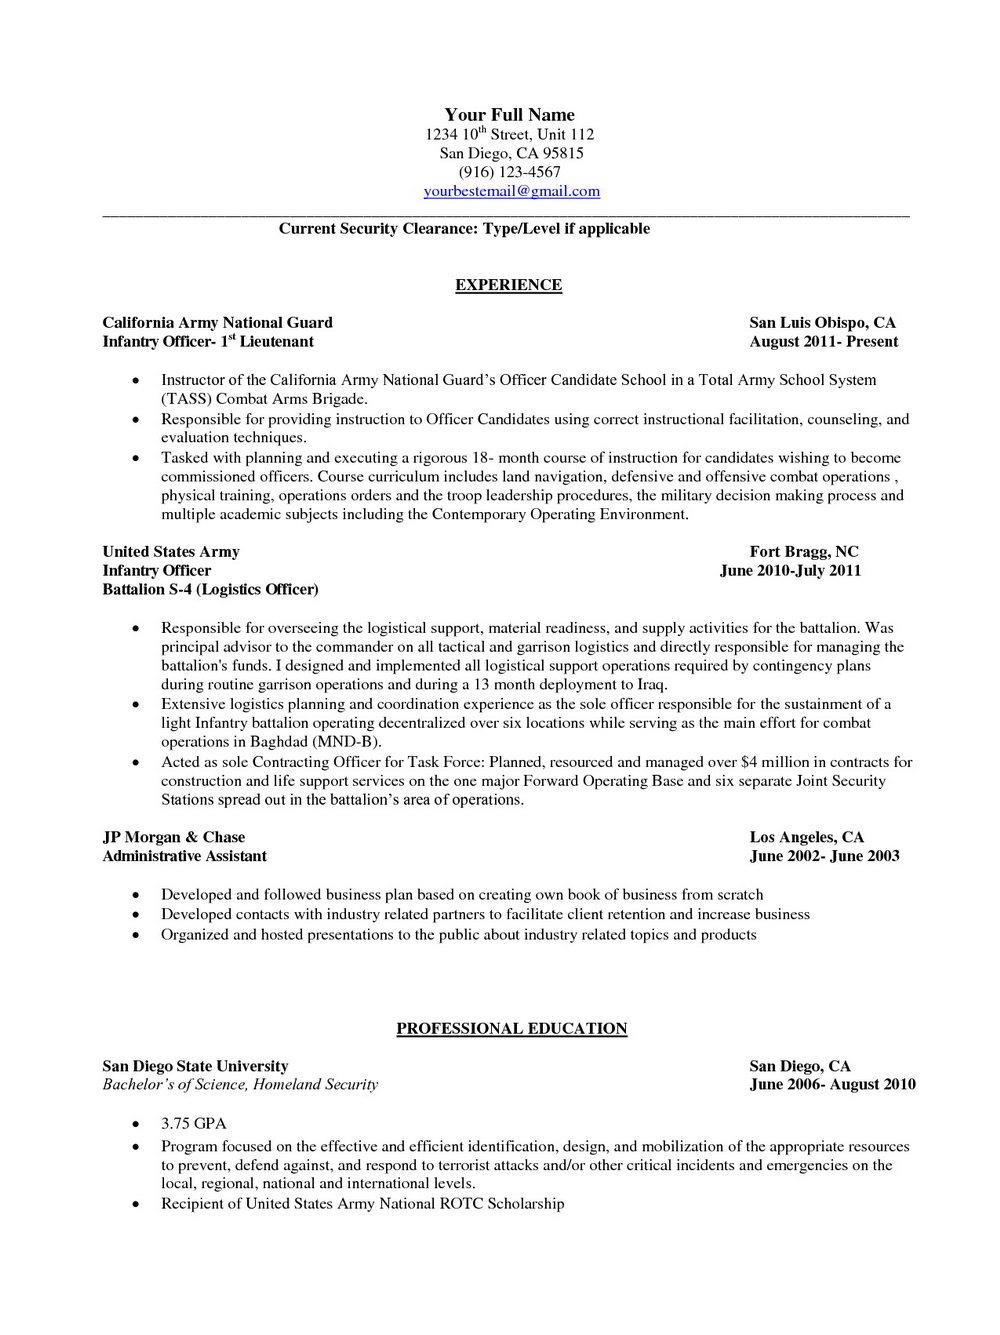 Military To Civilian Resume Skills